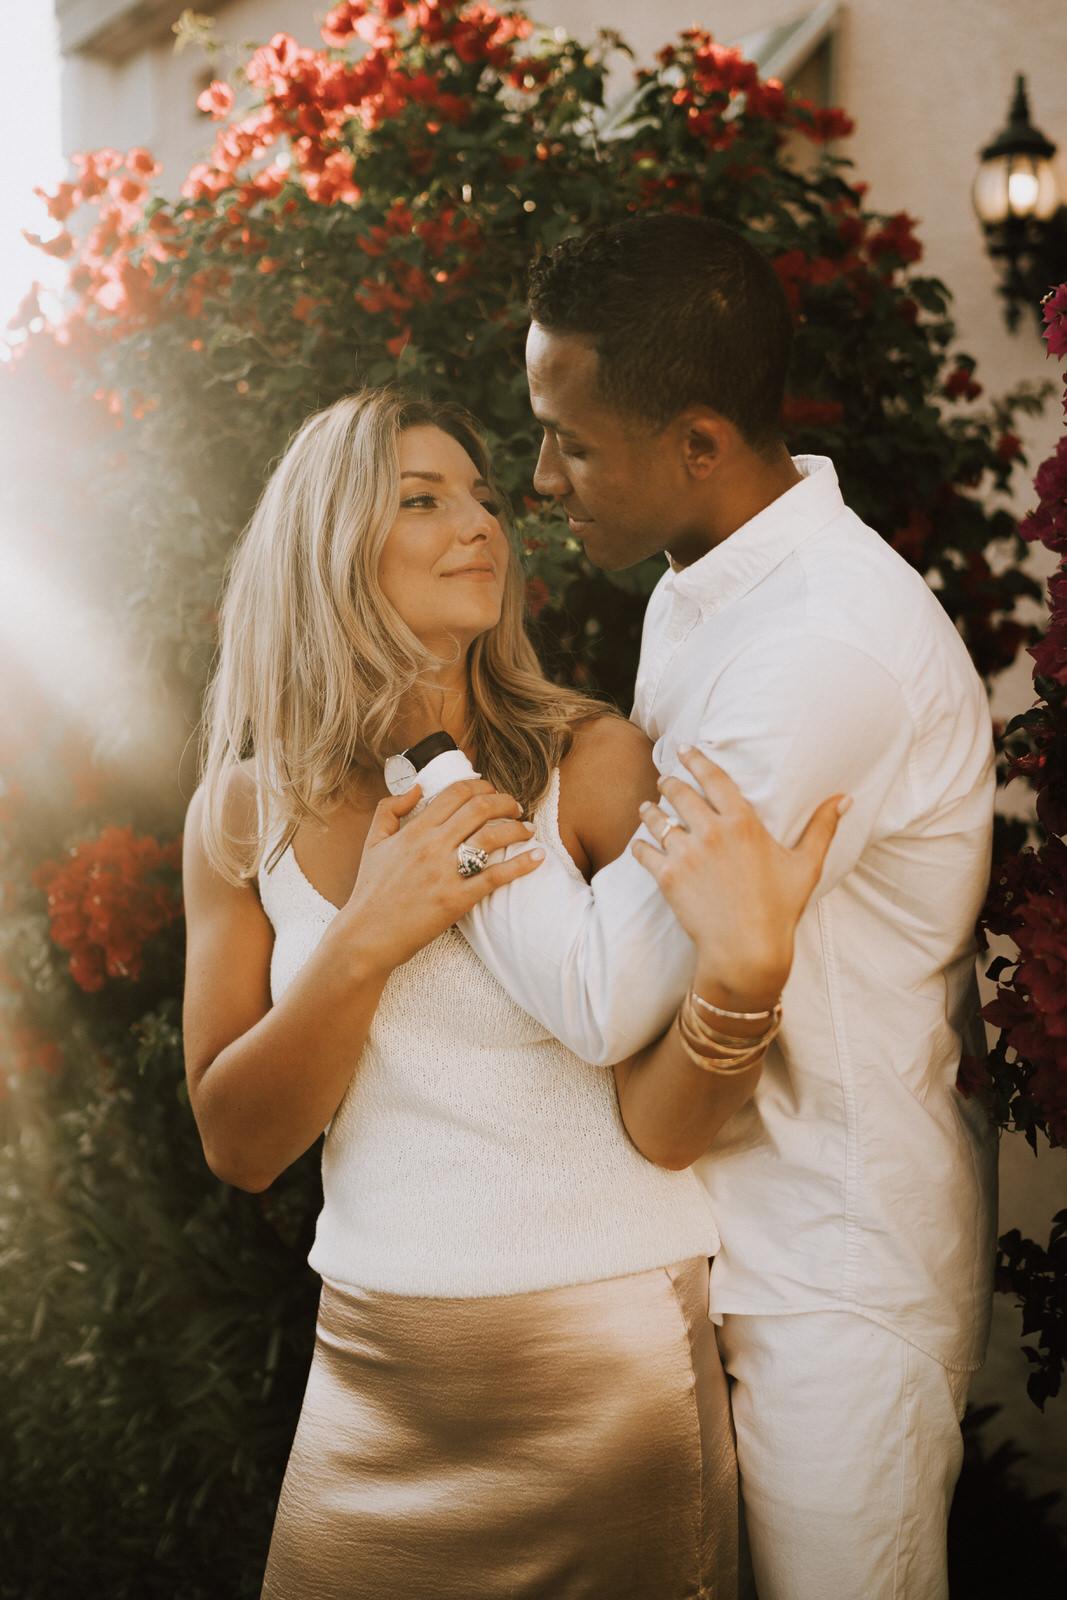 Naples 5th Ave Engagement Photos- Michelle Gonzalez Photography- Michele + Troy-177.JPG